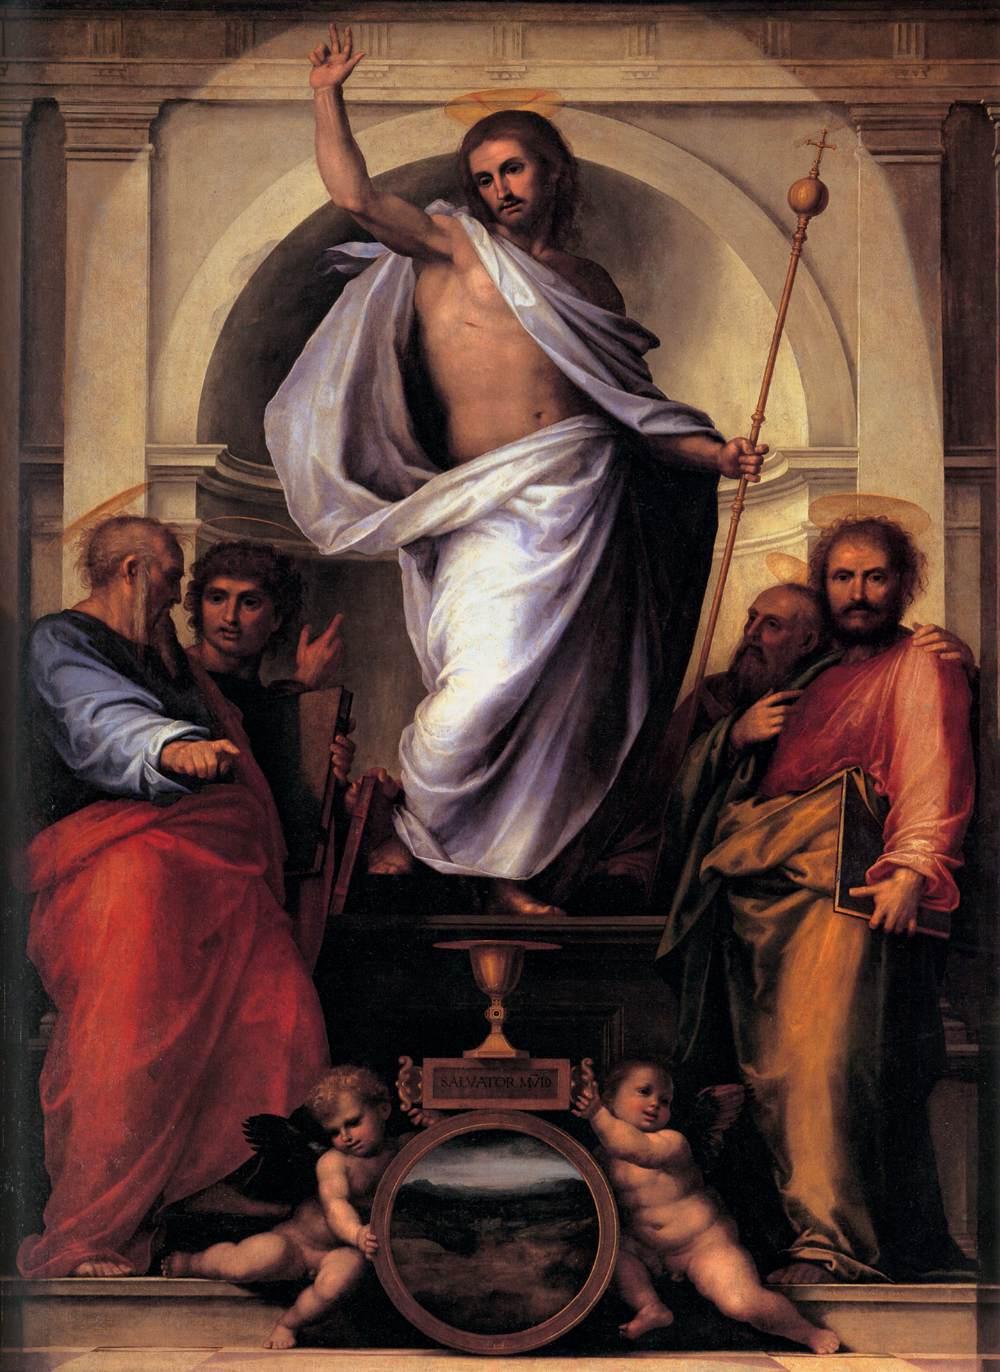 Artworks | Salvator mundi with the four evangelists